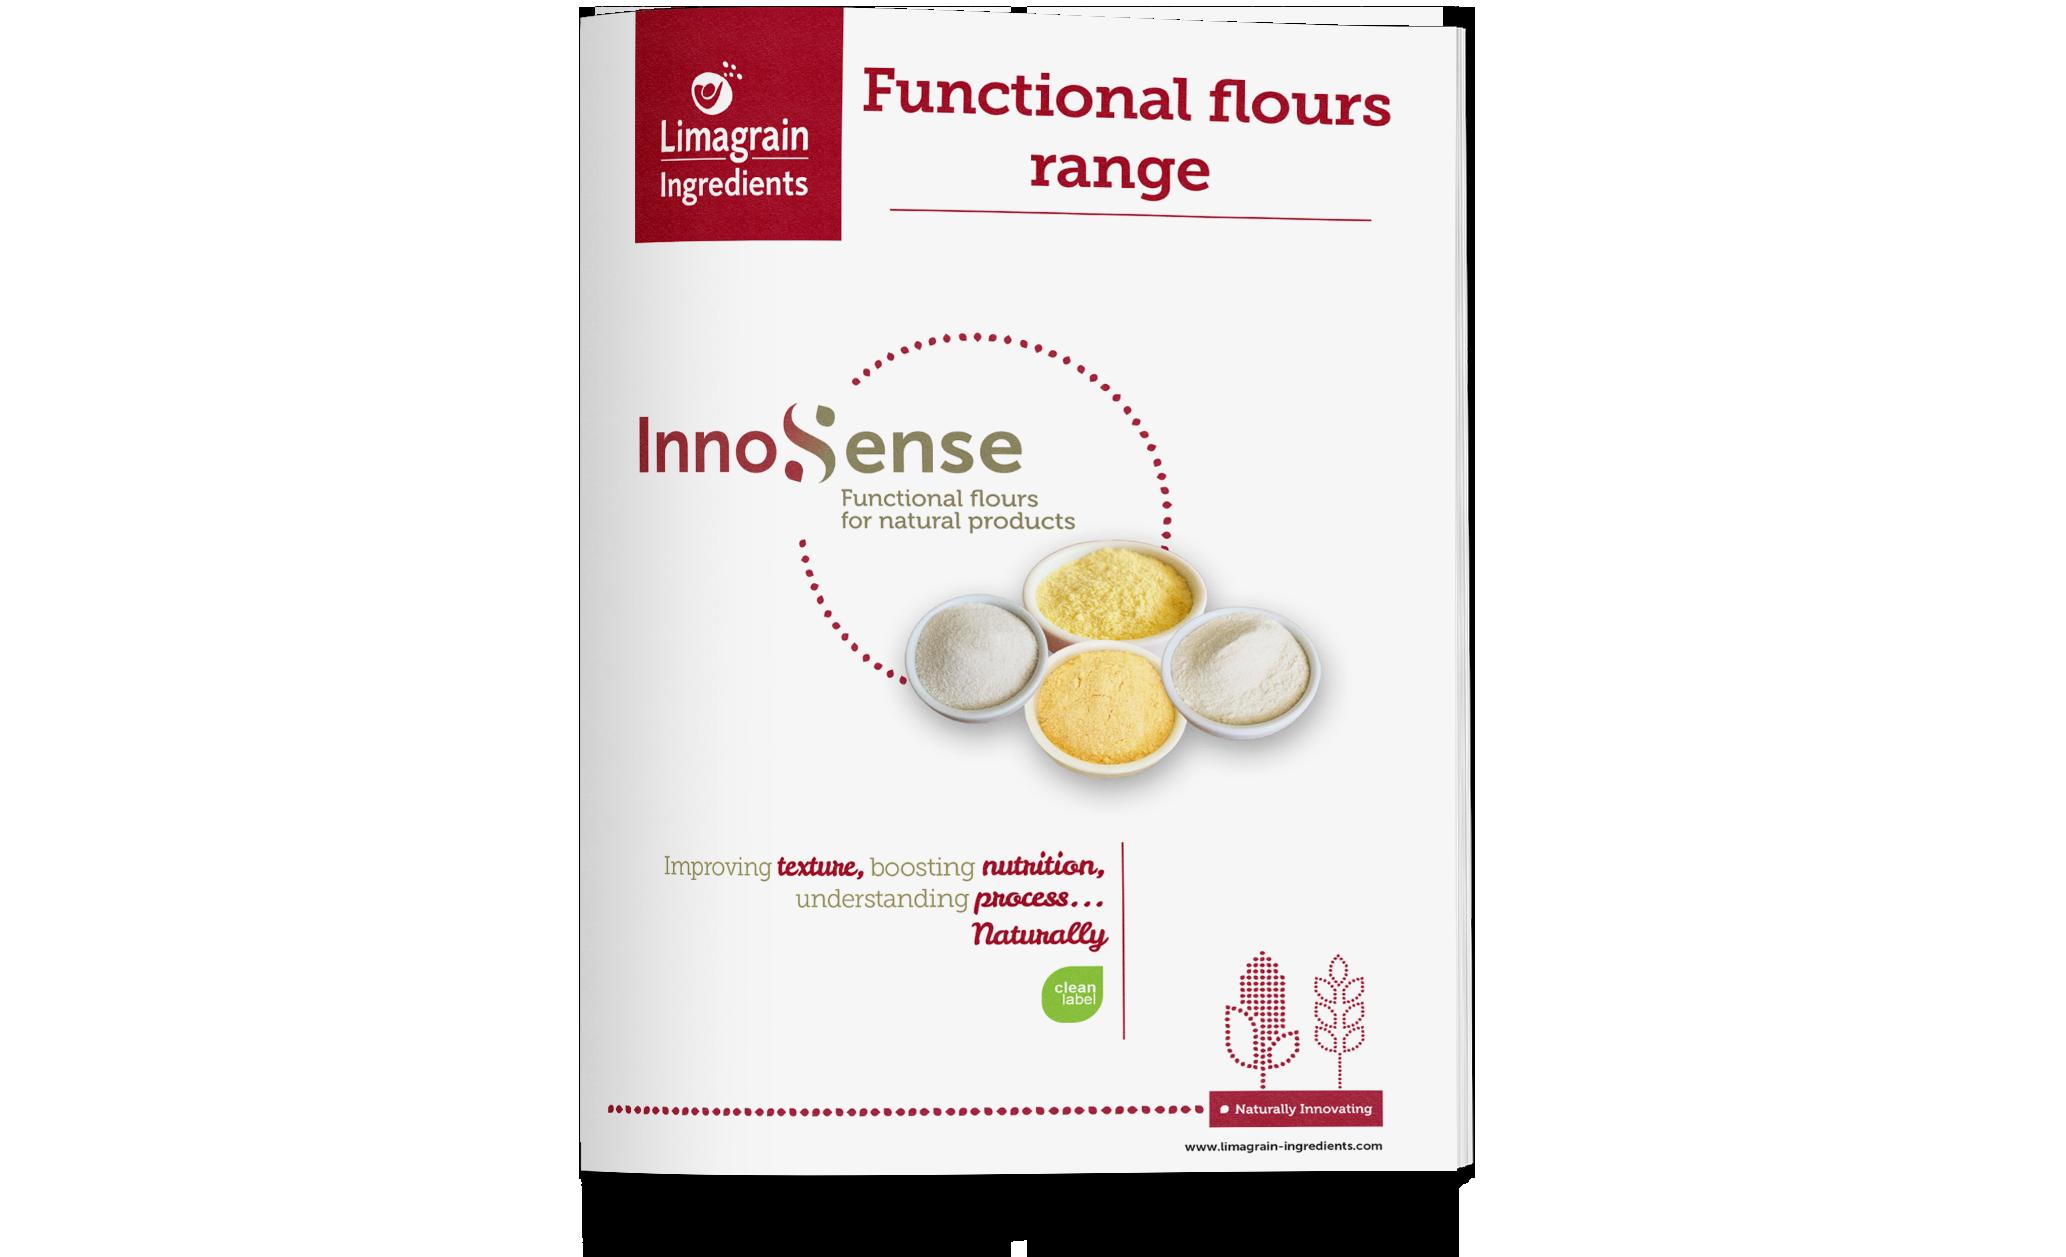 0109_functional_flours_range_brochure_EN